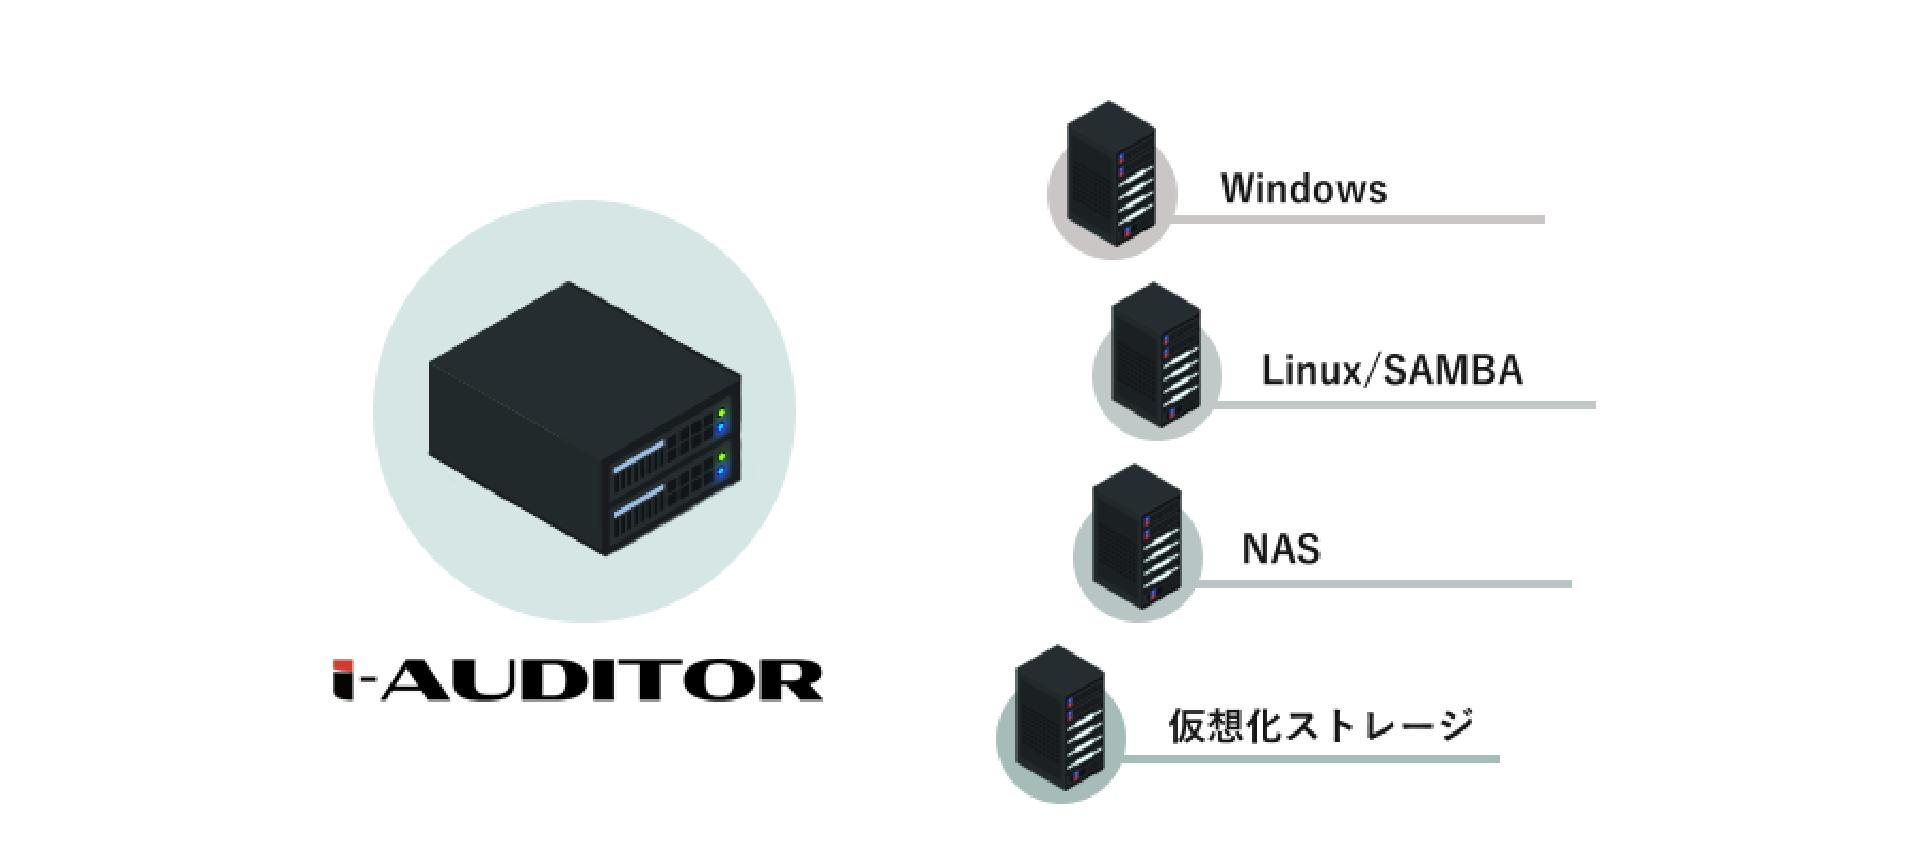 i-Auditor概要のイメージ